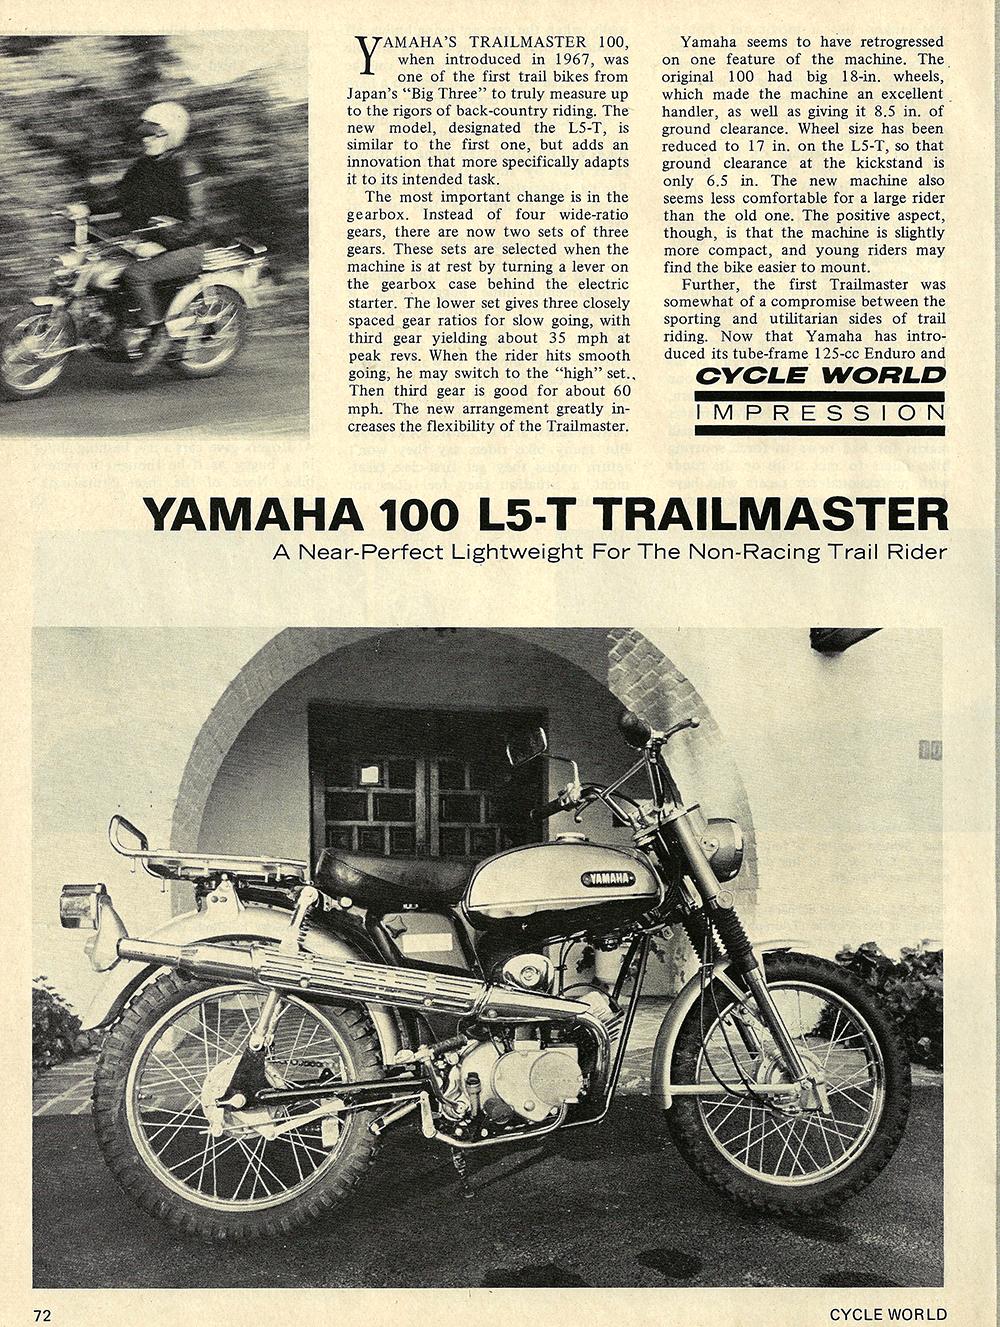 1969 Yamaha L5T Trailmaster 100 road test 01.jpg